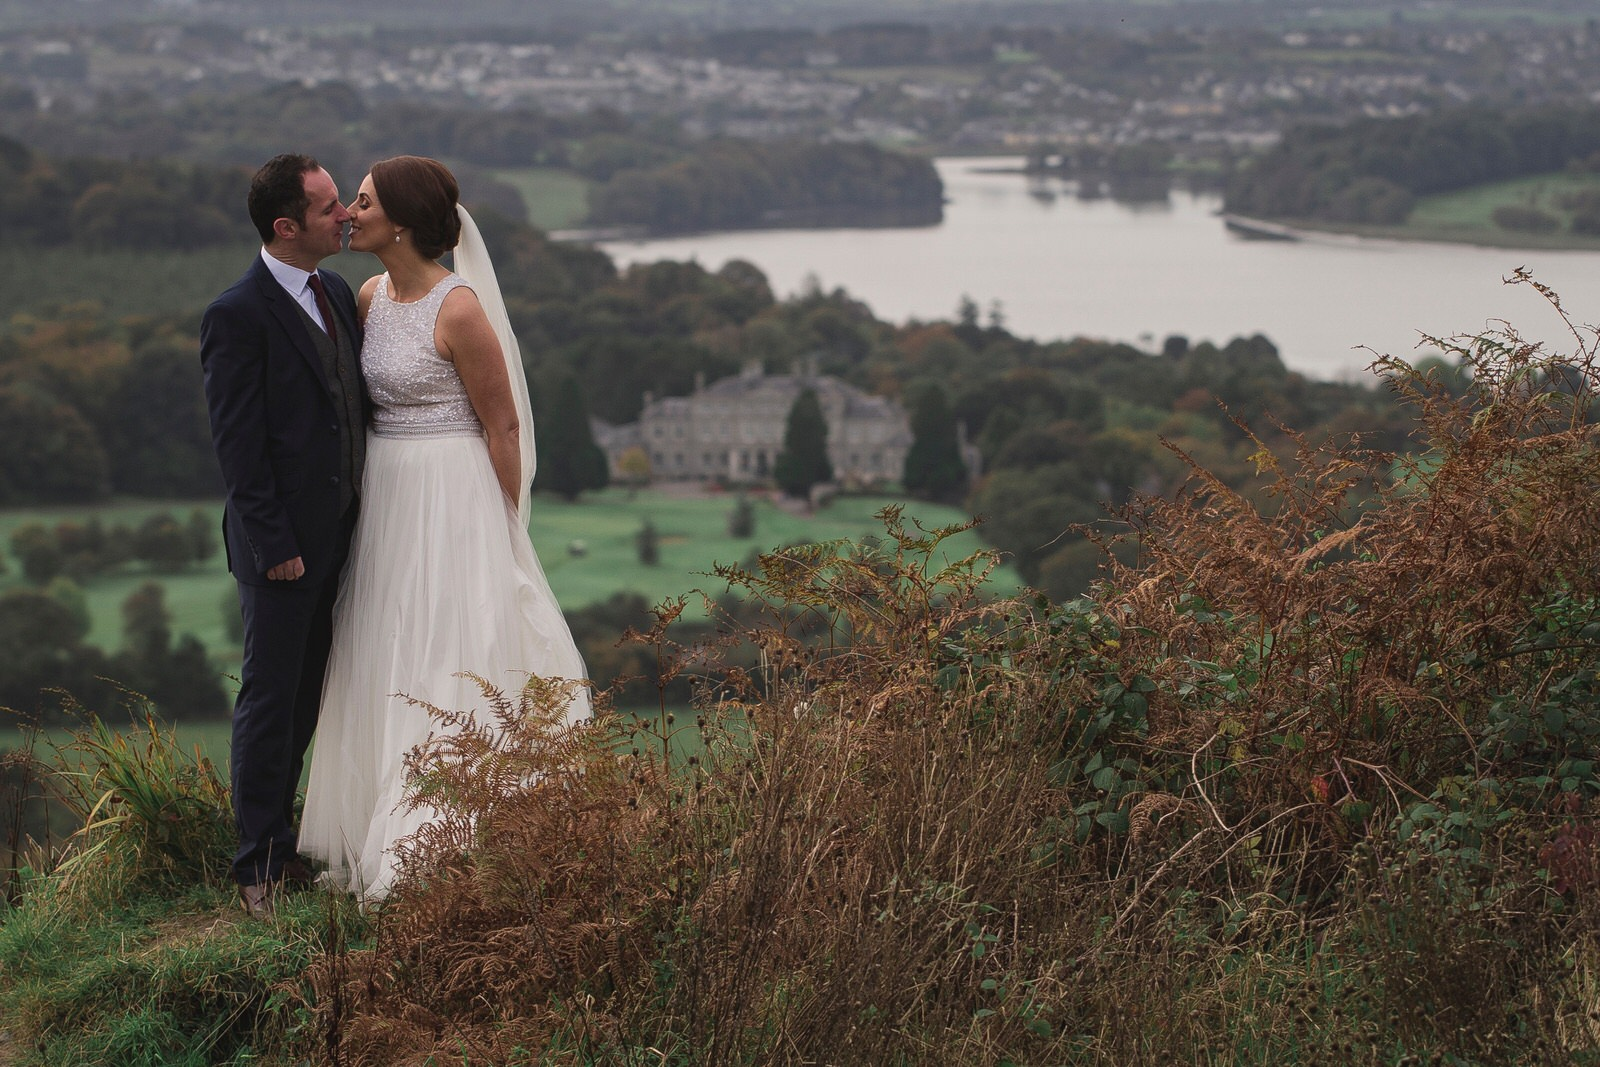 waterford_faithlegg_wedding_photographer_goldenmonentsweddingphotography_a567.jpg